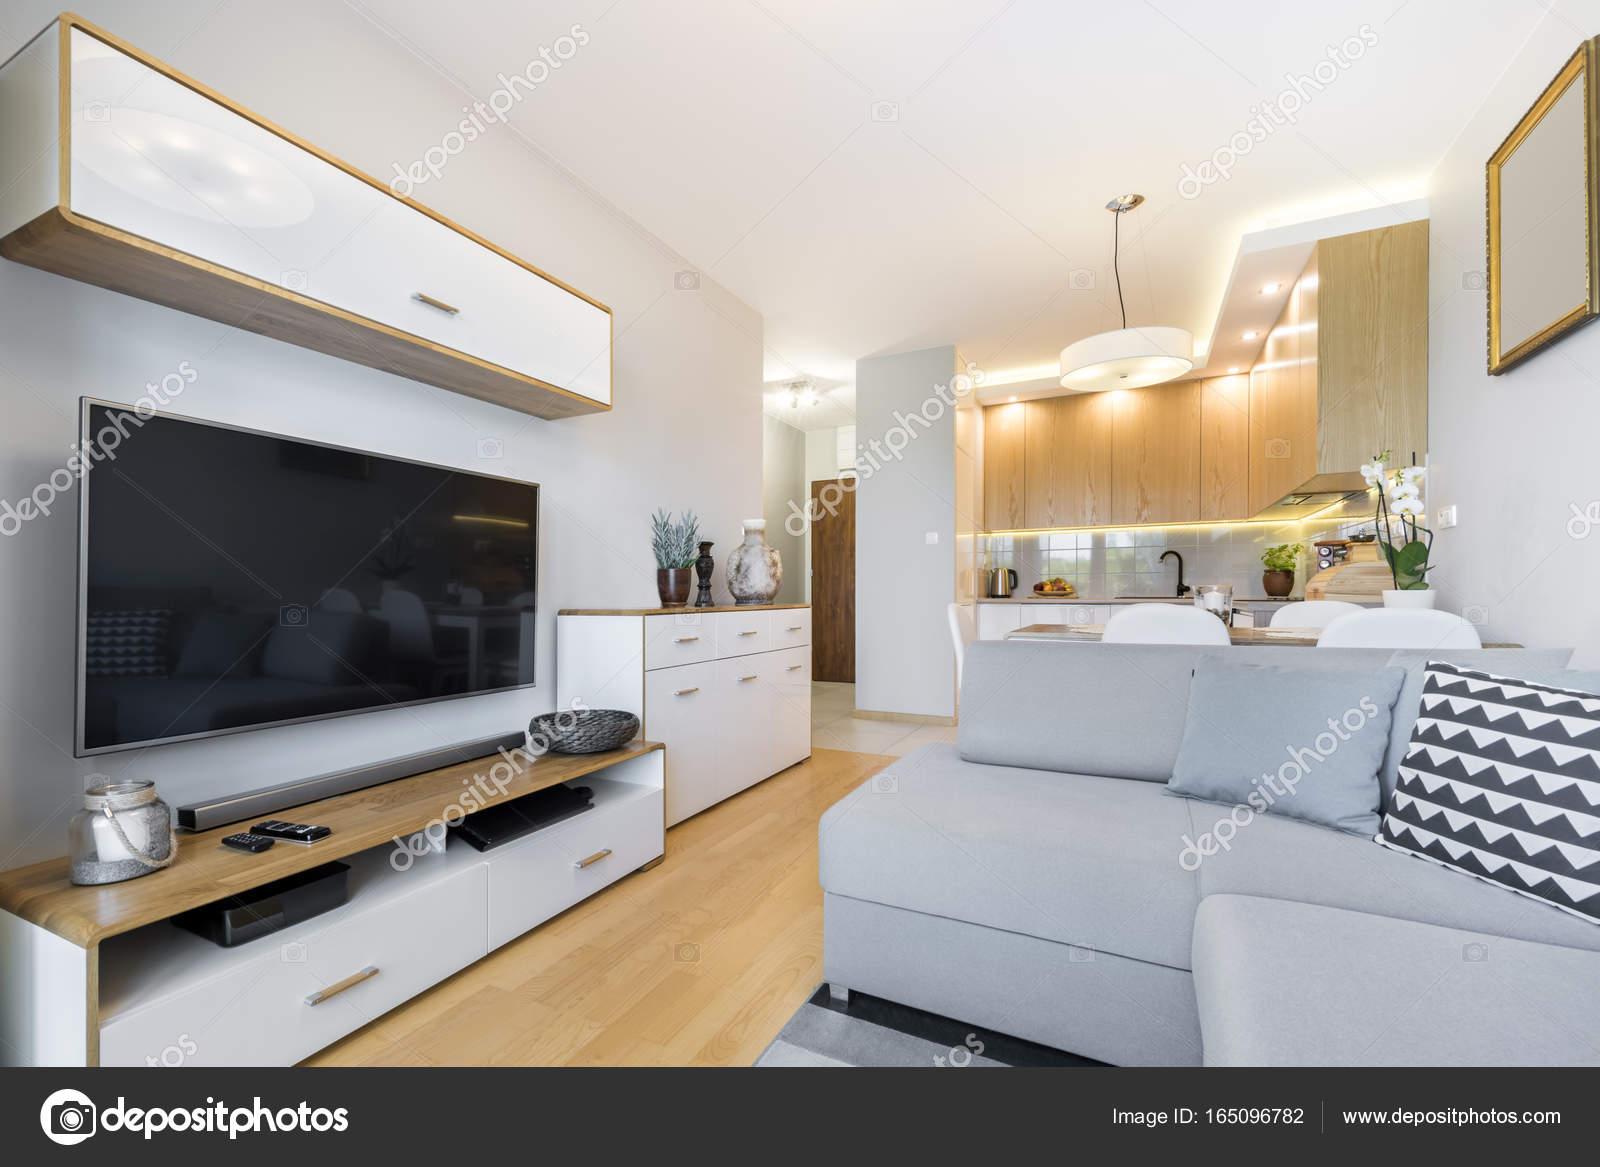 modern interieur woonkamer — Stockfoto © jacek_kadaj #165096782